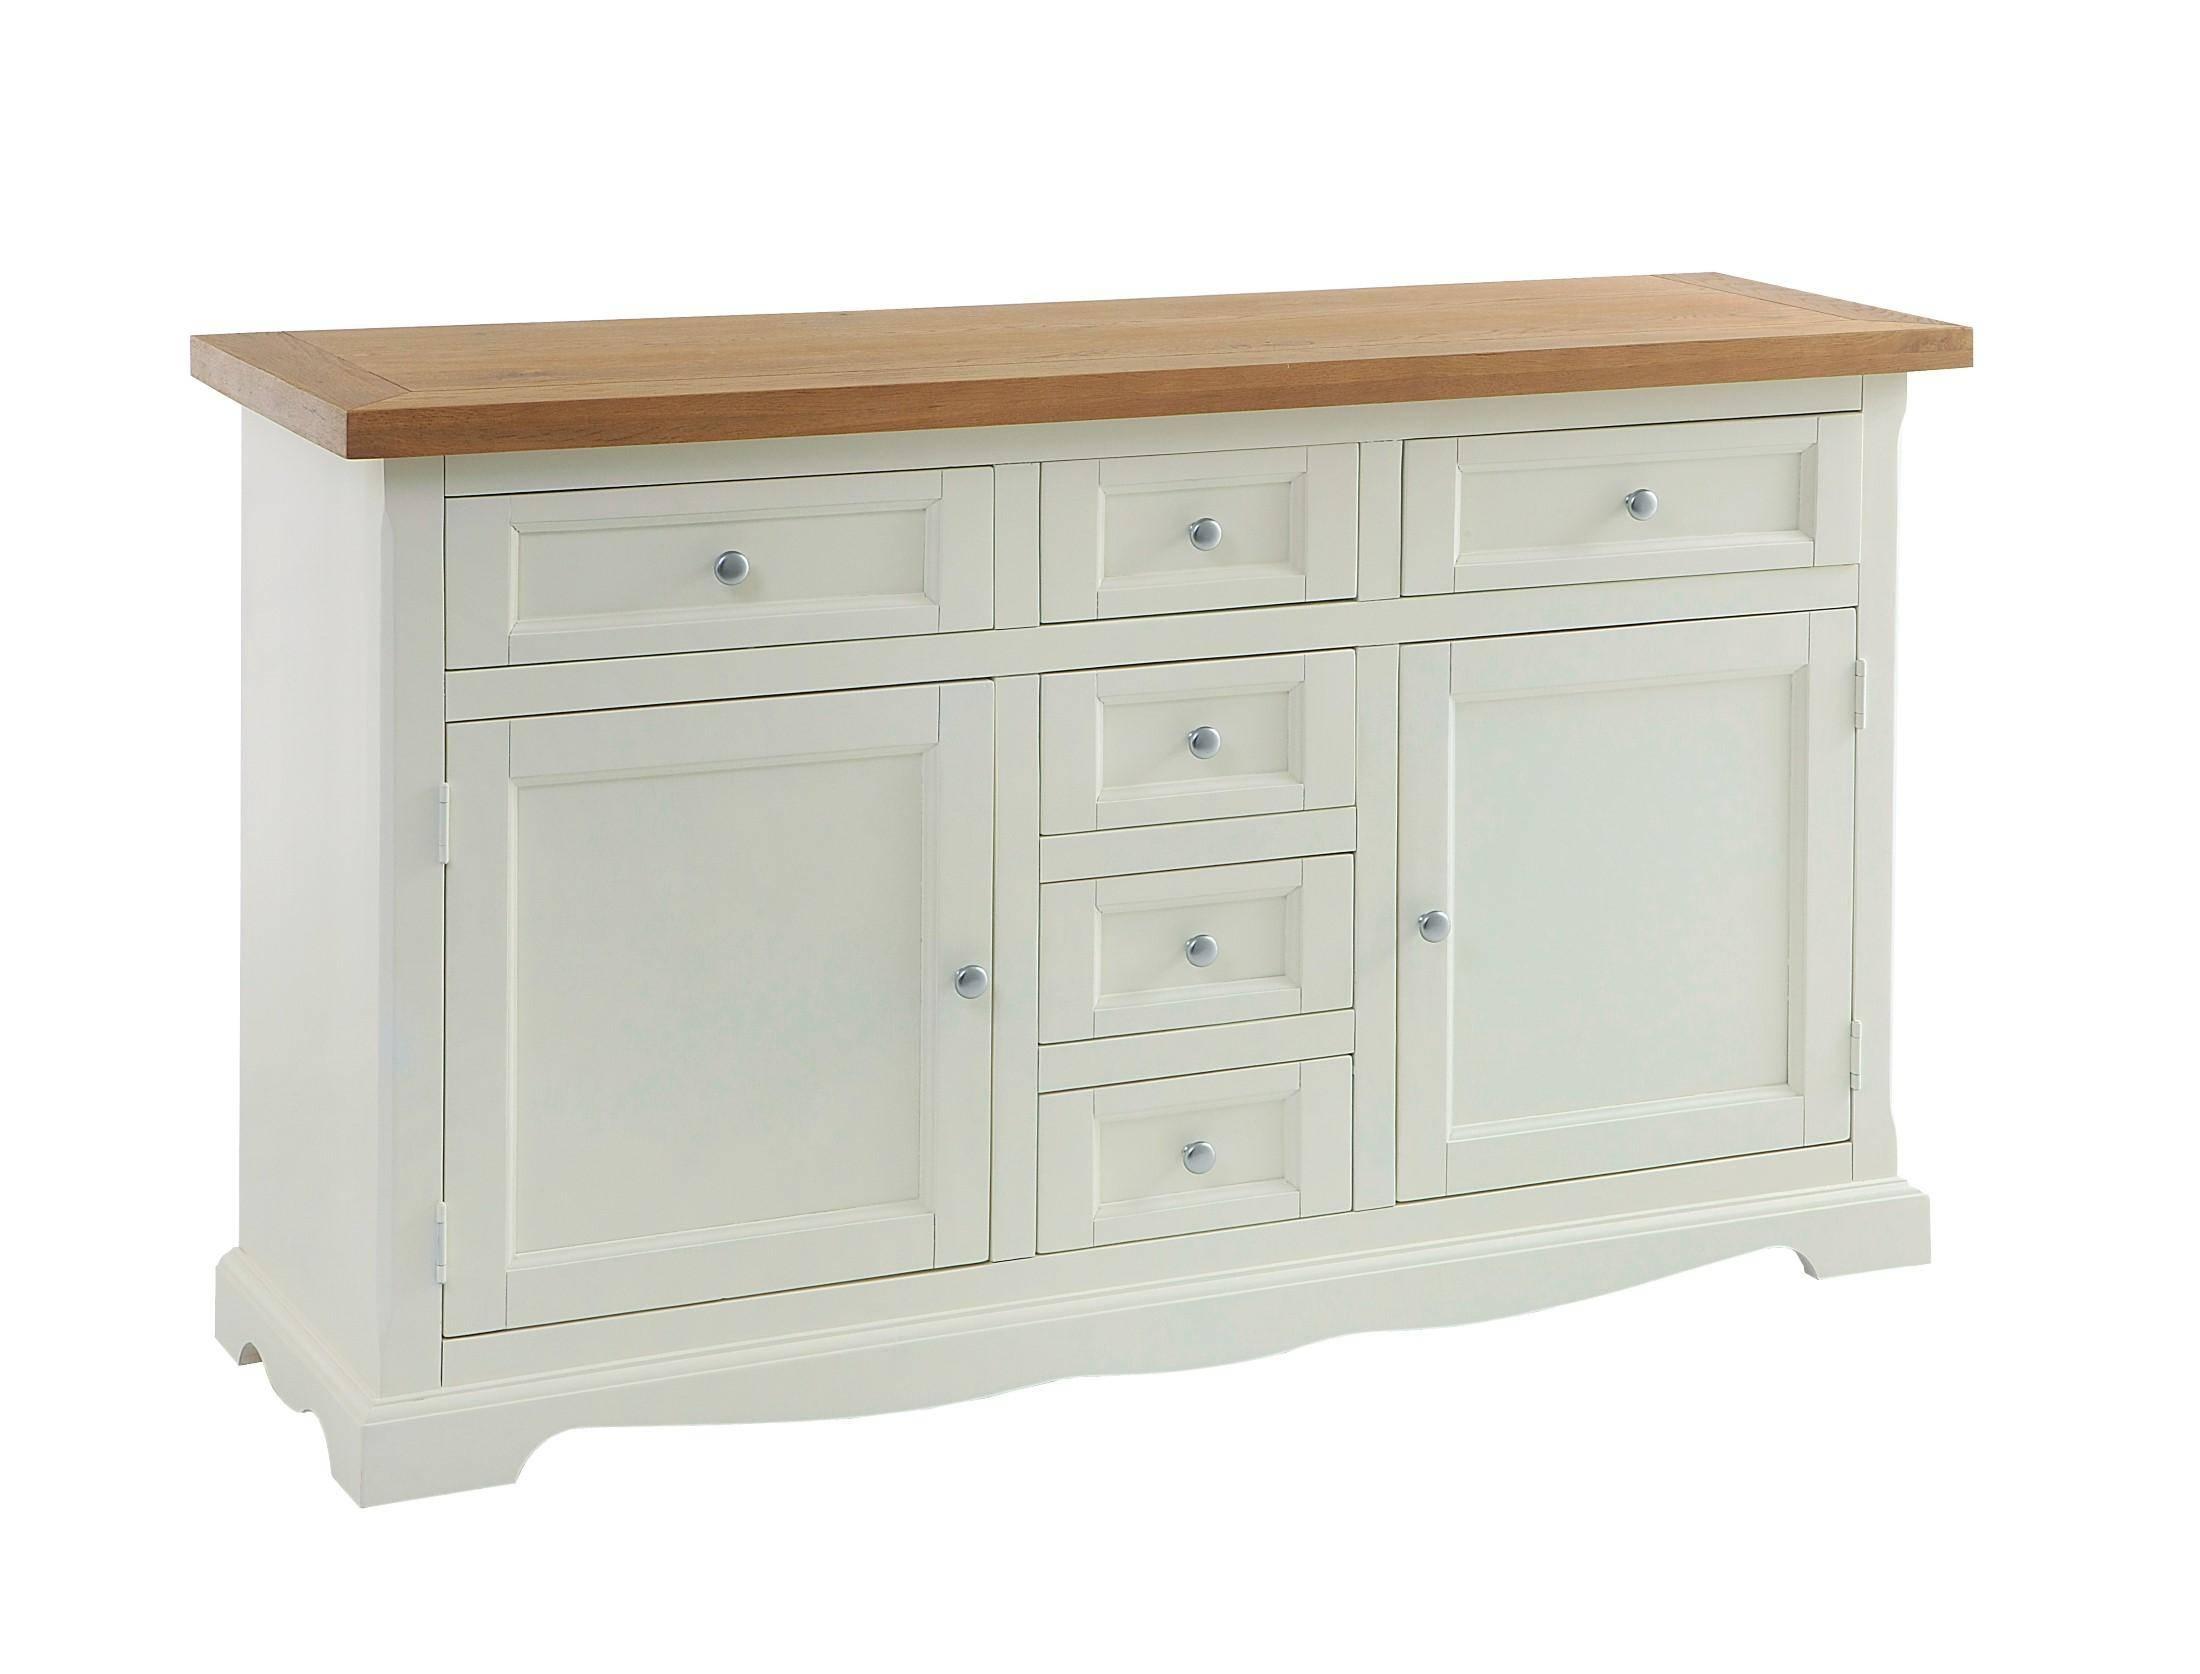 Large Irish Sideboard Cream – Flowerhill Furniture Regarding Cream Sideboards (#7 of 15)